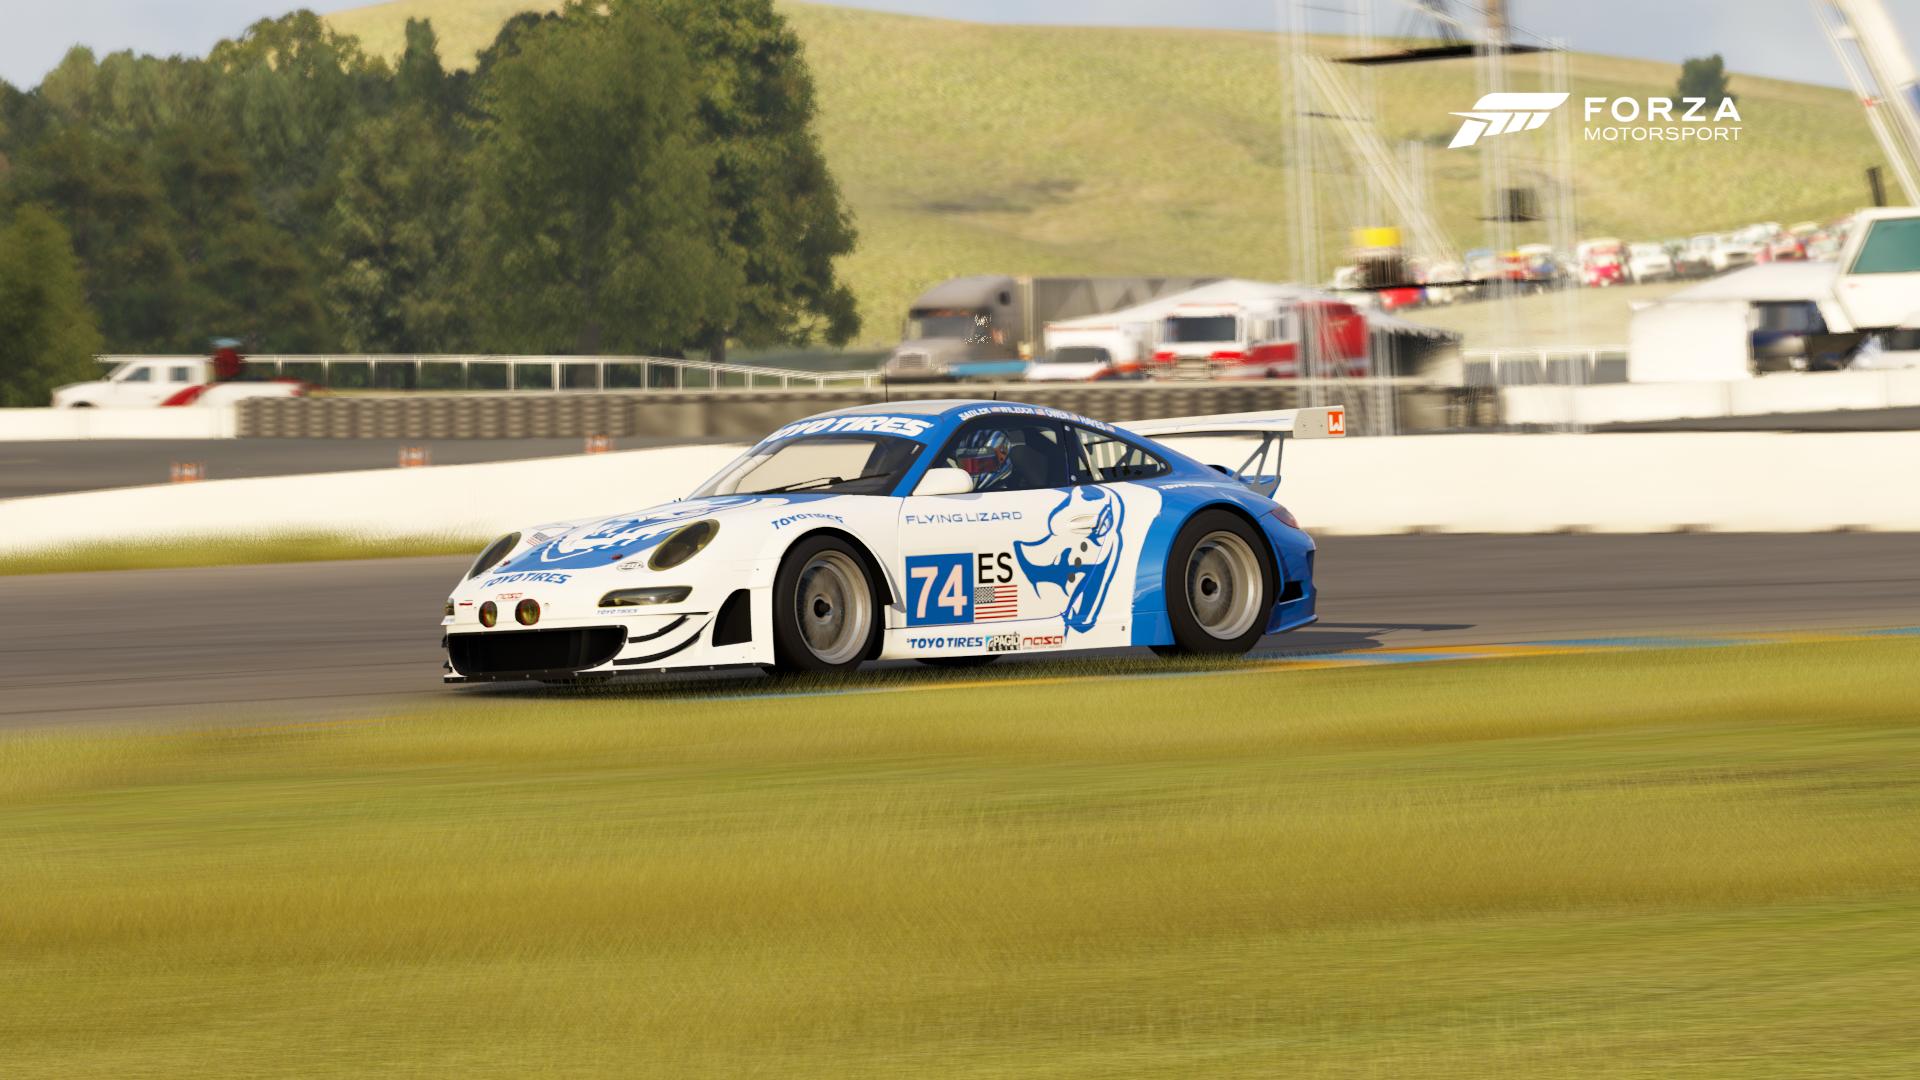 Forza Motorsport 6 (42).png